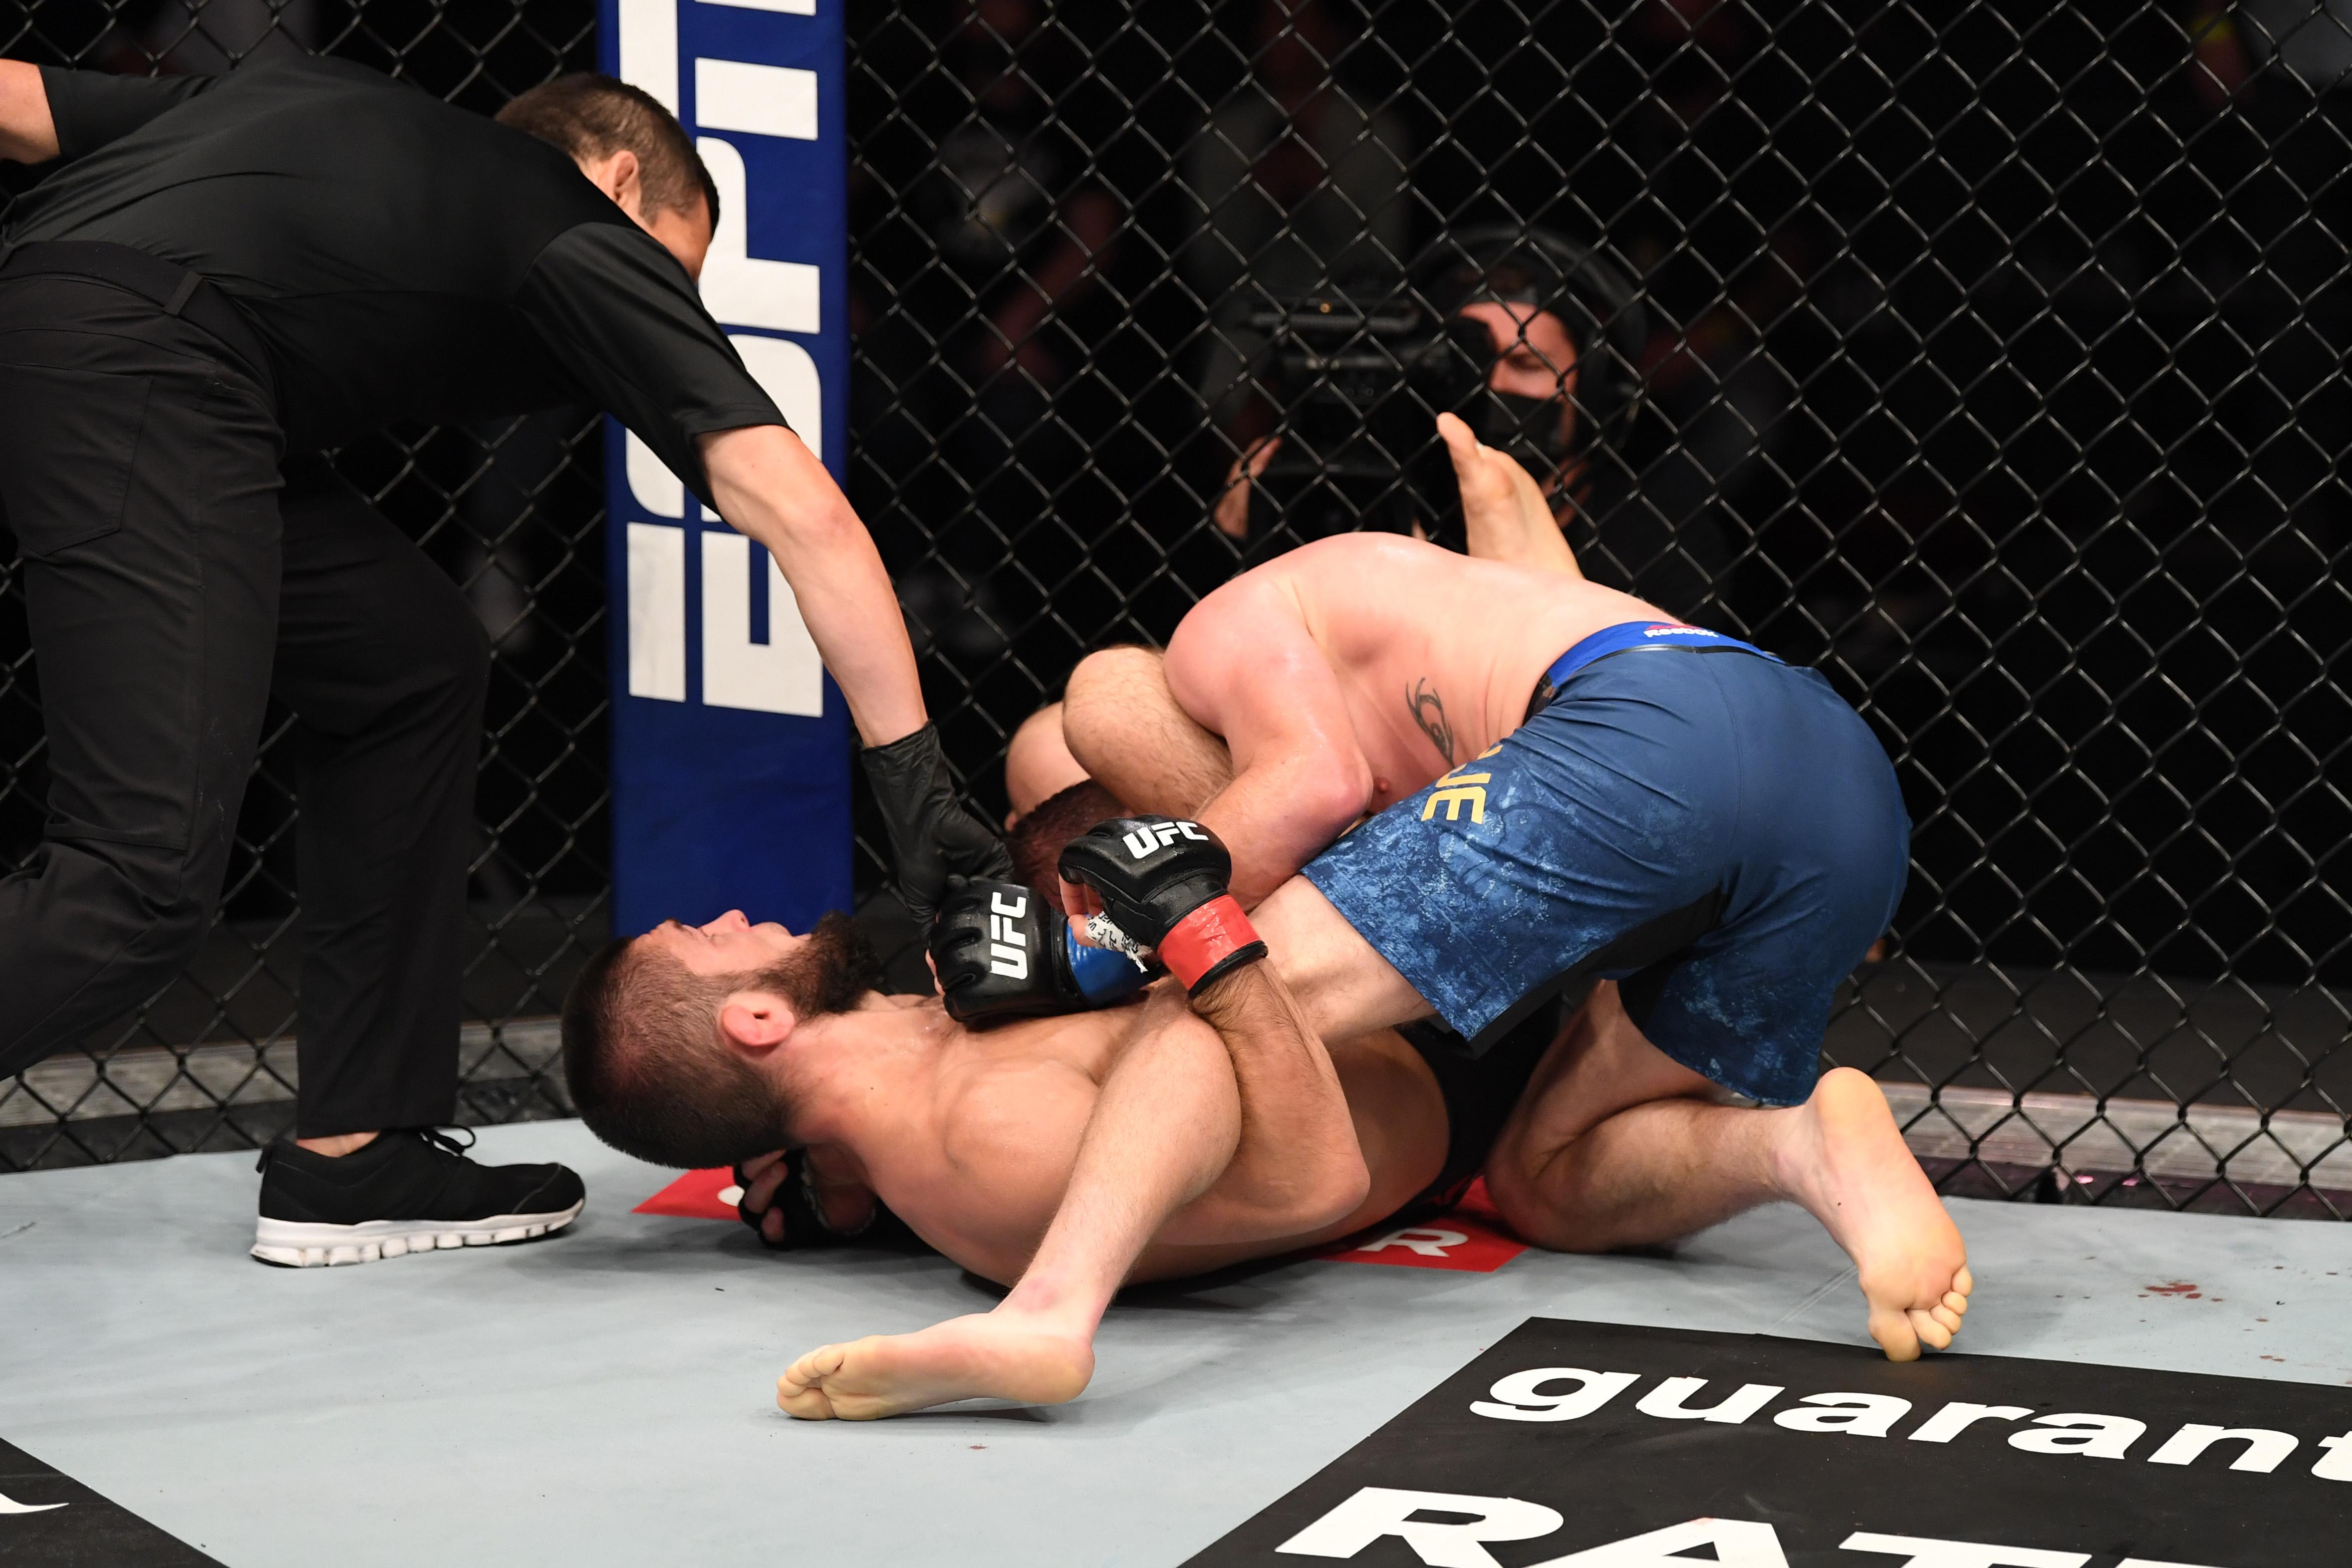 Khabib Nurmagomedov puts Justin Gaethje to sleep with a triangle choke at UFC 254.